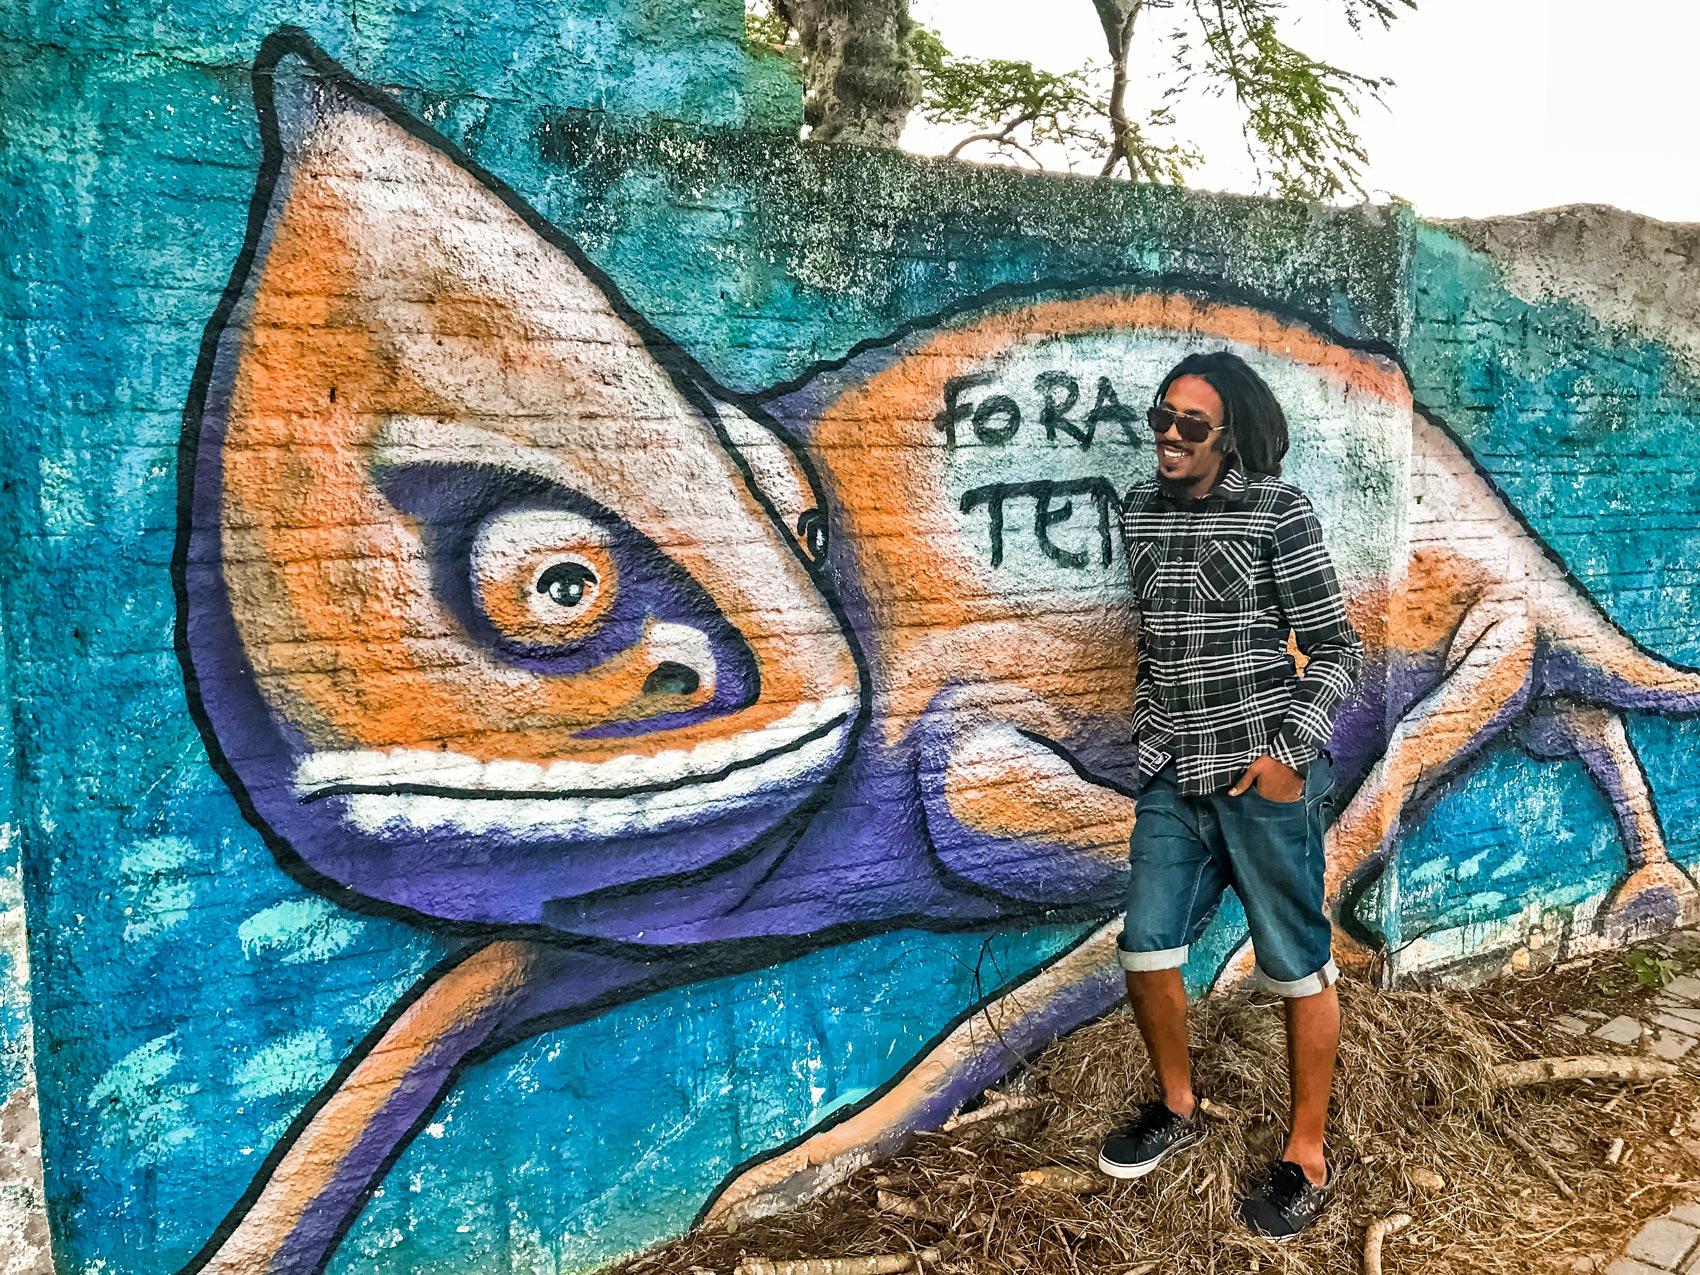 Rastaman in front of chameleon graffiti in Florianópolis, Brazil